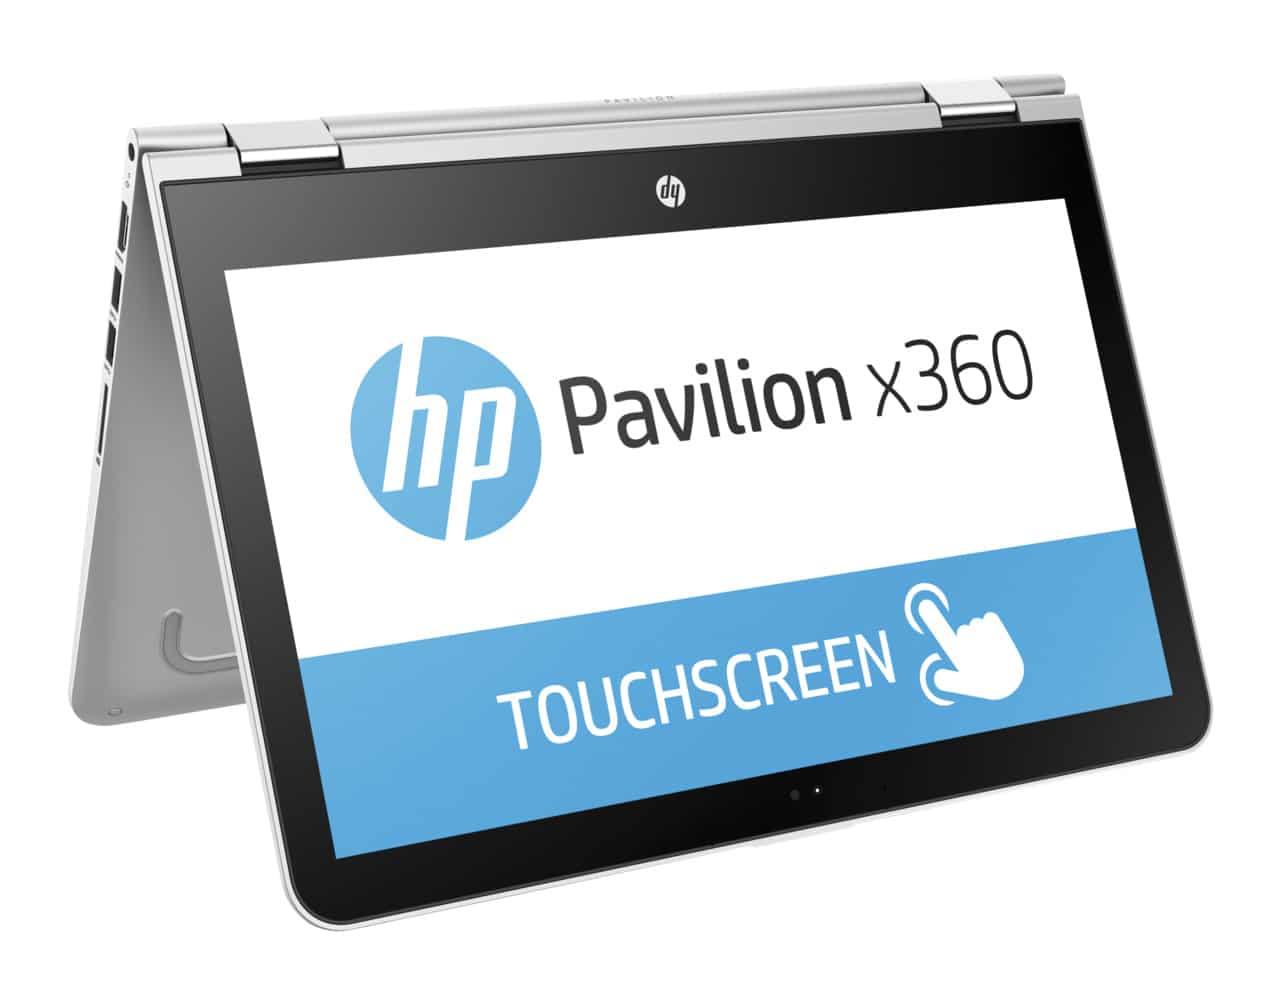 HP Pavilion x360 13-u108nf, Ultrabook 13 pouces IPS Tablette SSD256 (649€)